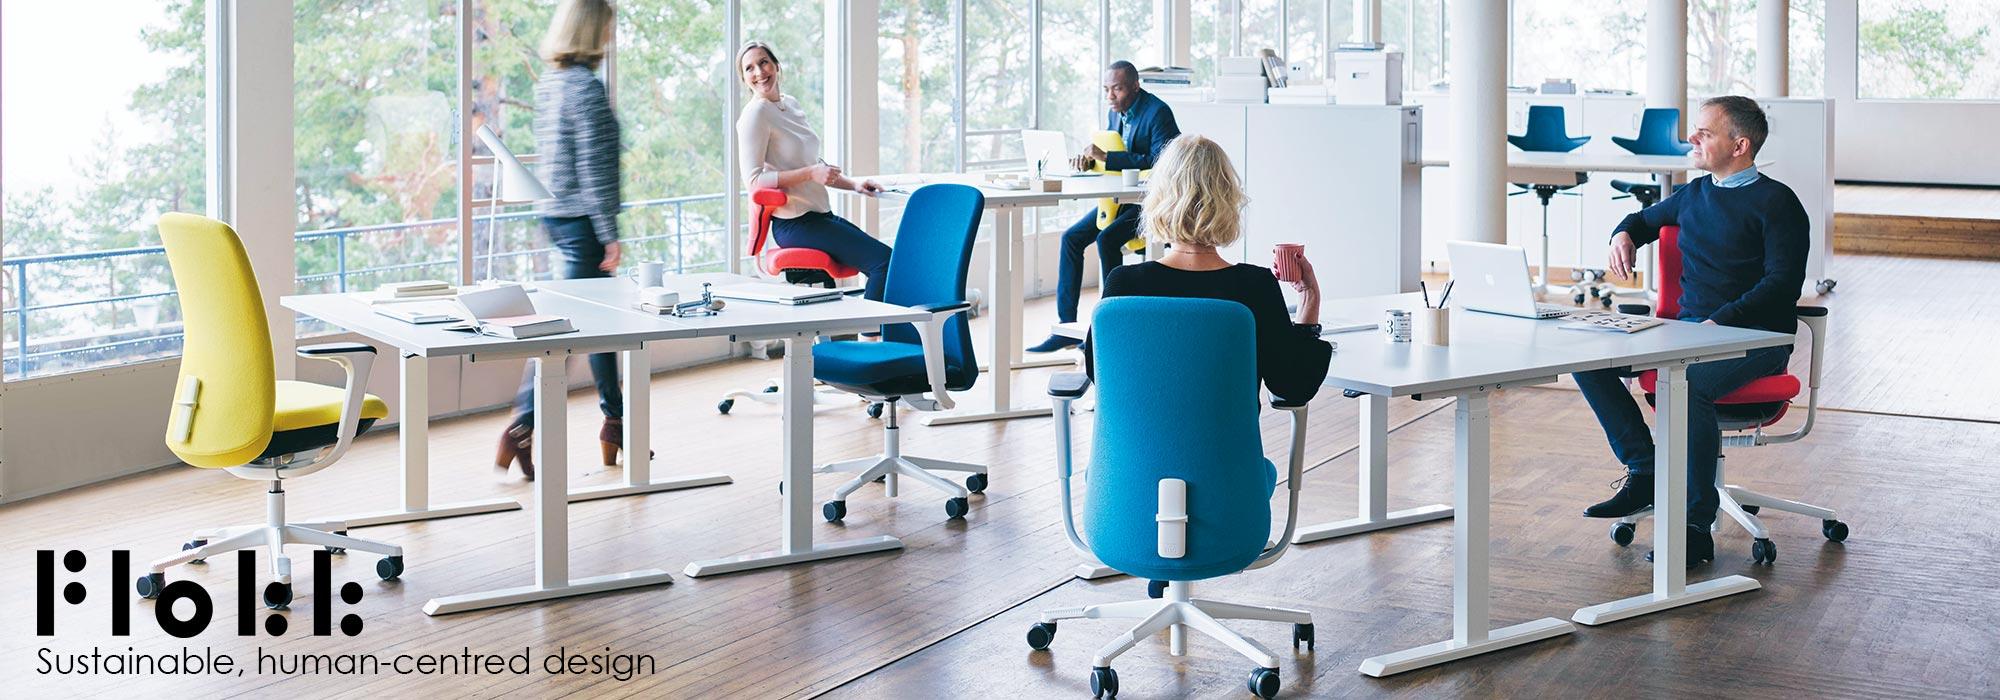 Flokk - Sustainable, Human-Centred Design